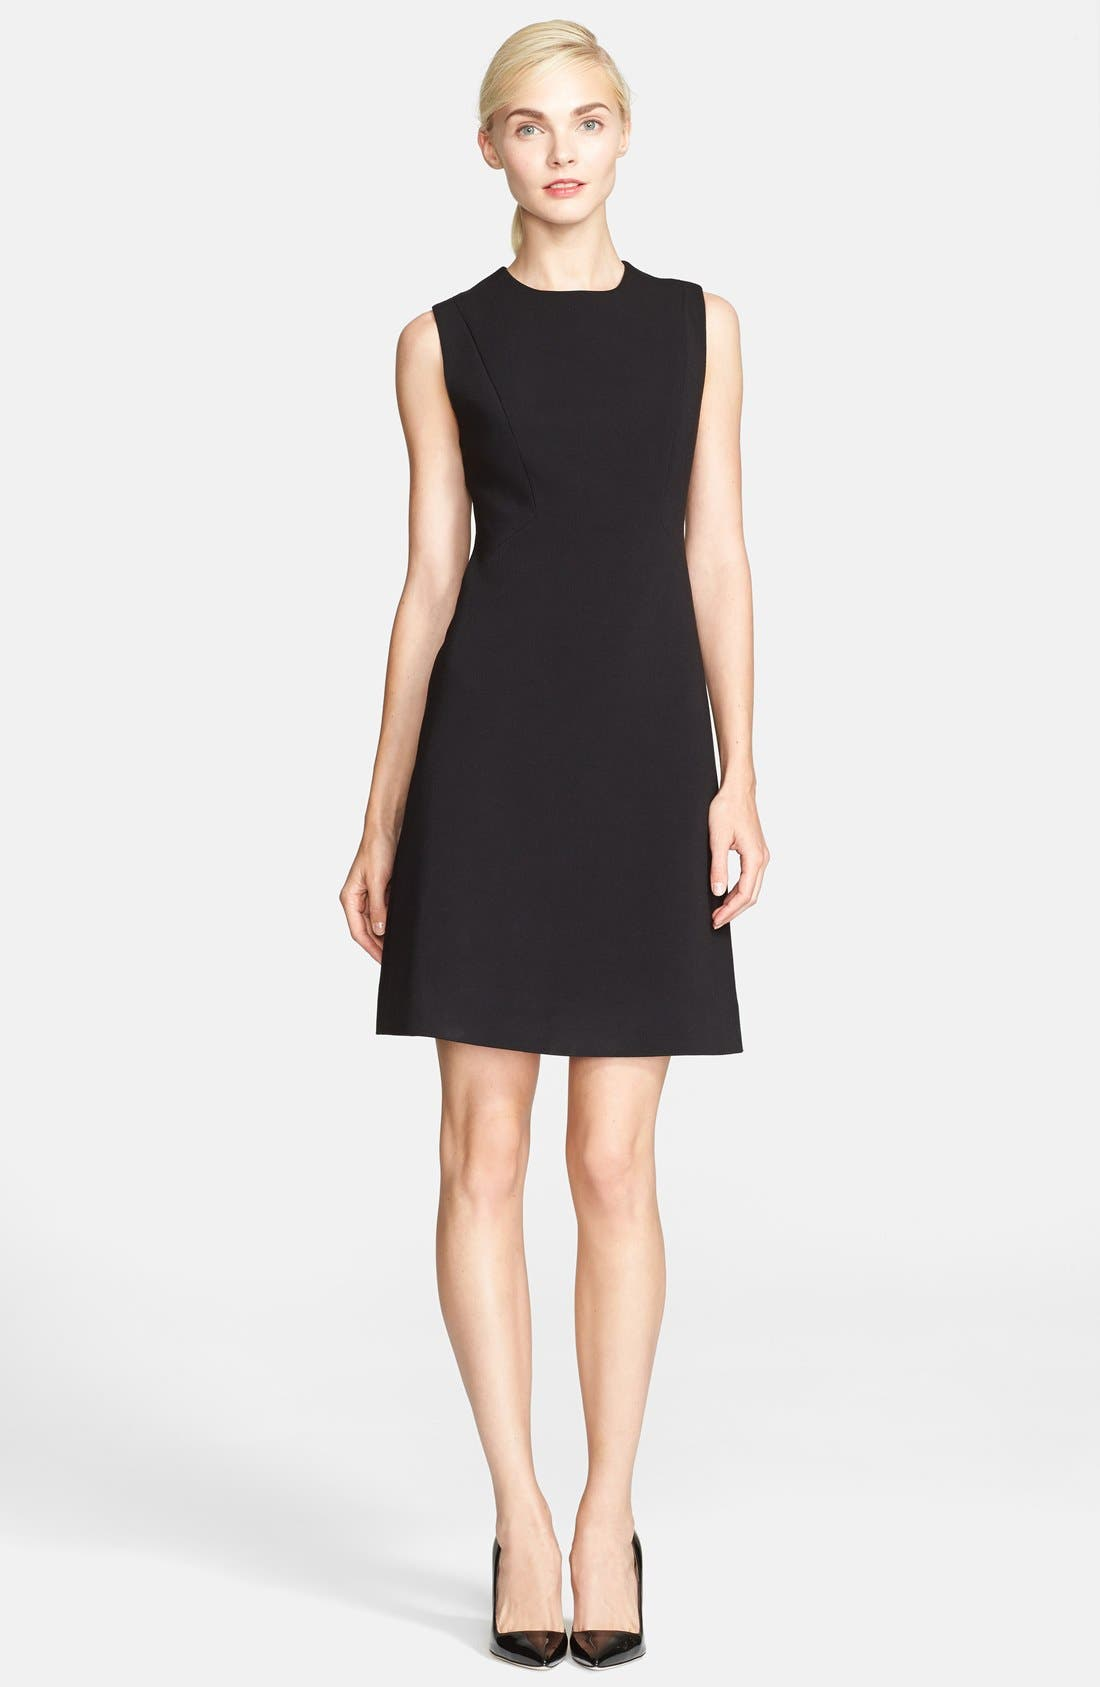 kate spade new york 'sicily' sheath dress